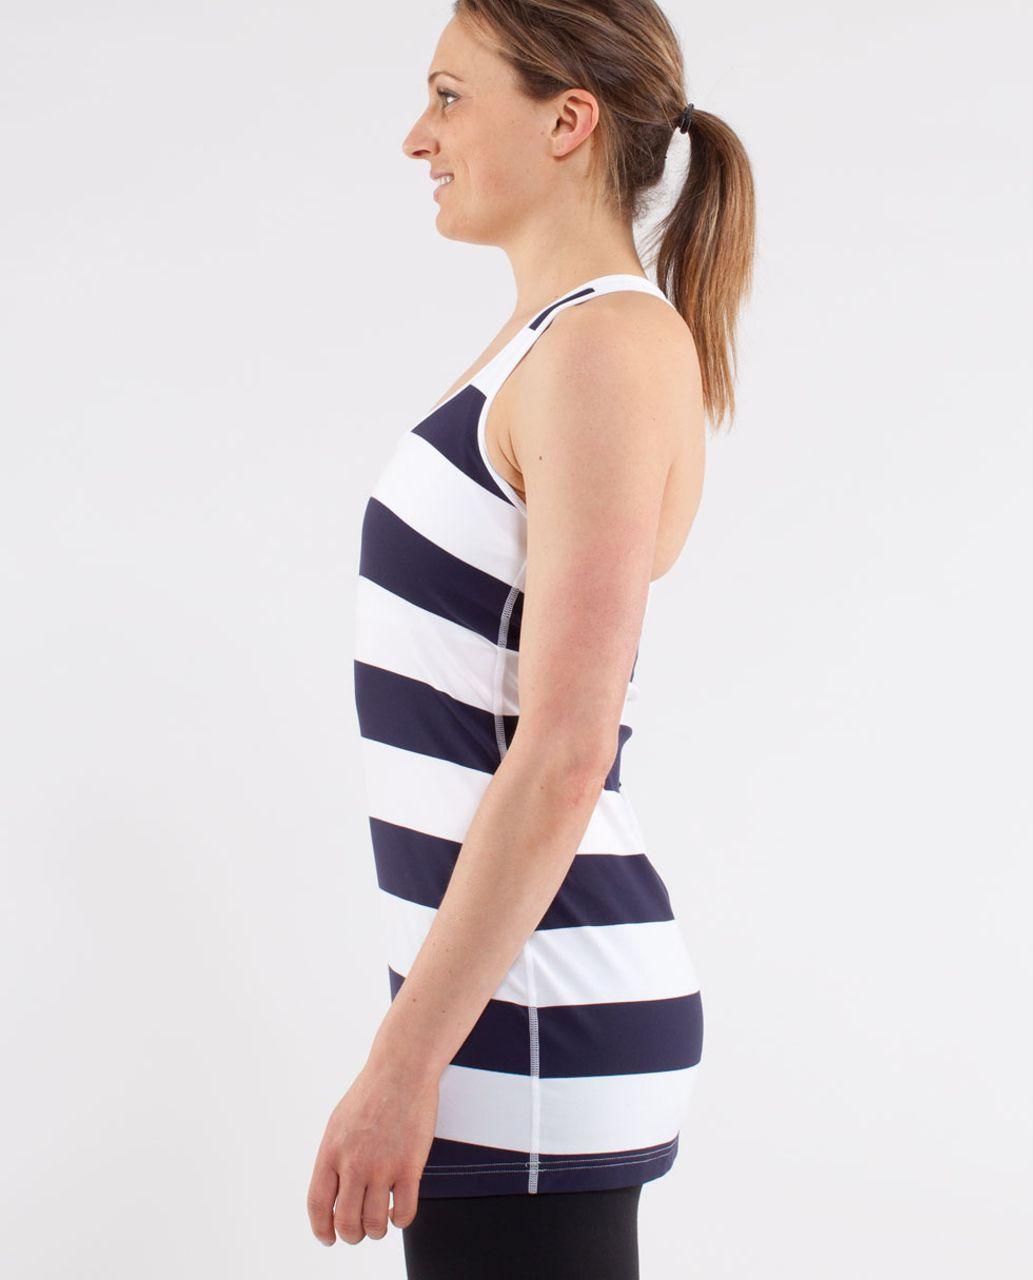 Lululemon Cool Racerback - Wide Bold Stripe White Deep Indigo /  Quiet Stripe White Deep Indigo (White Contrast)